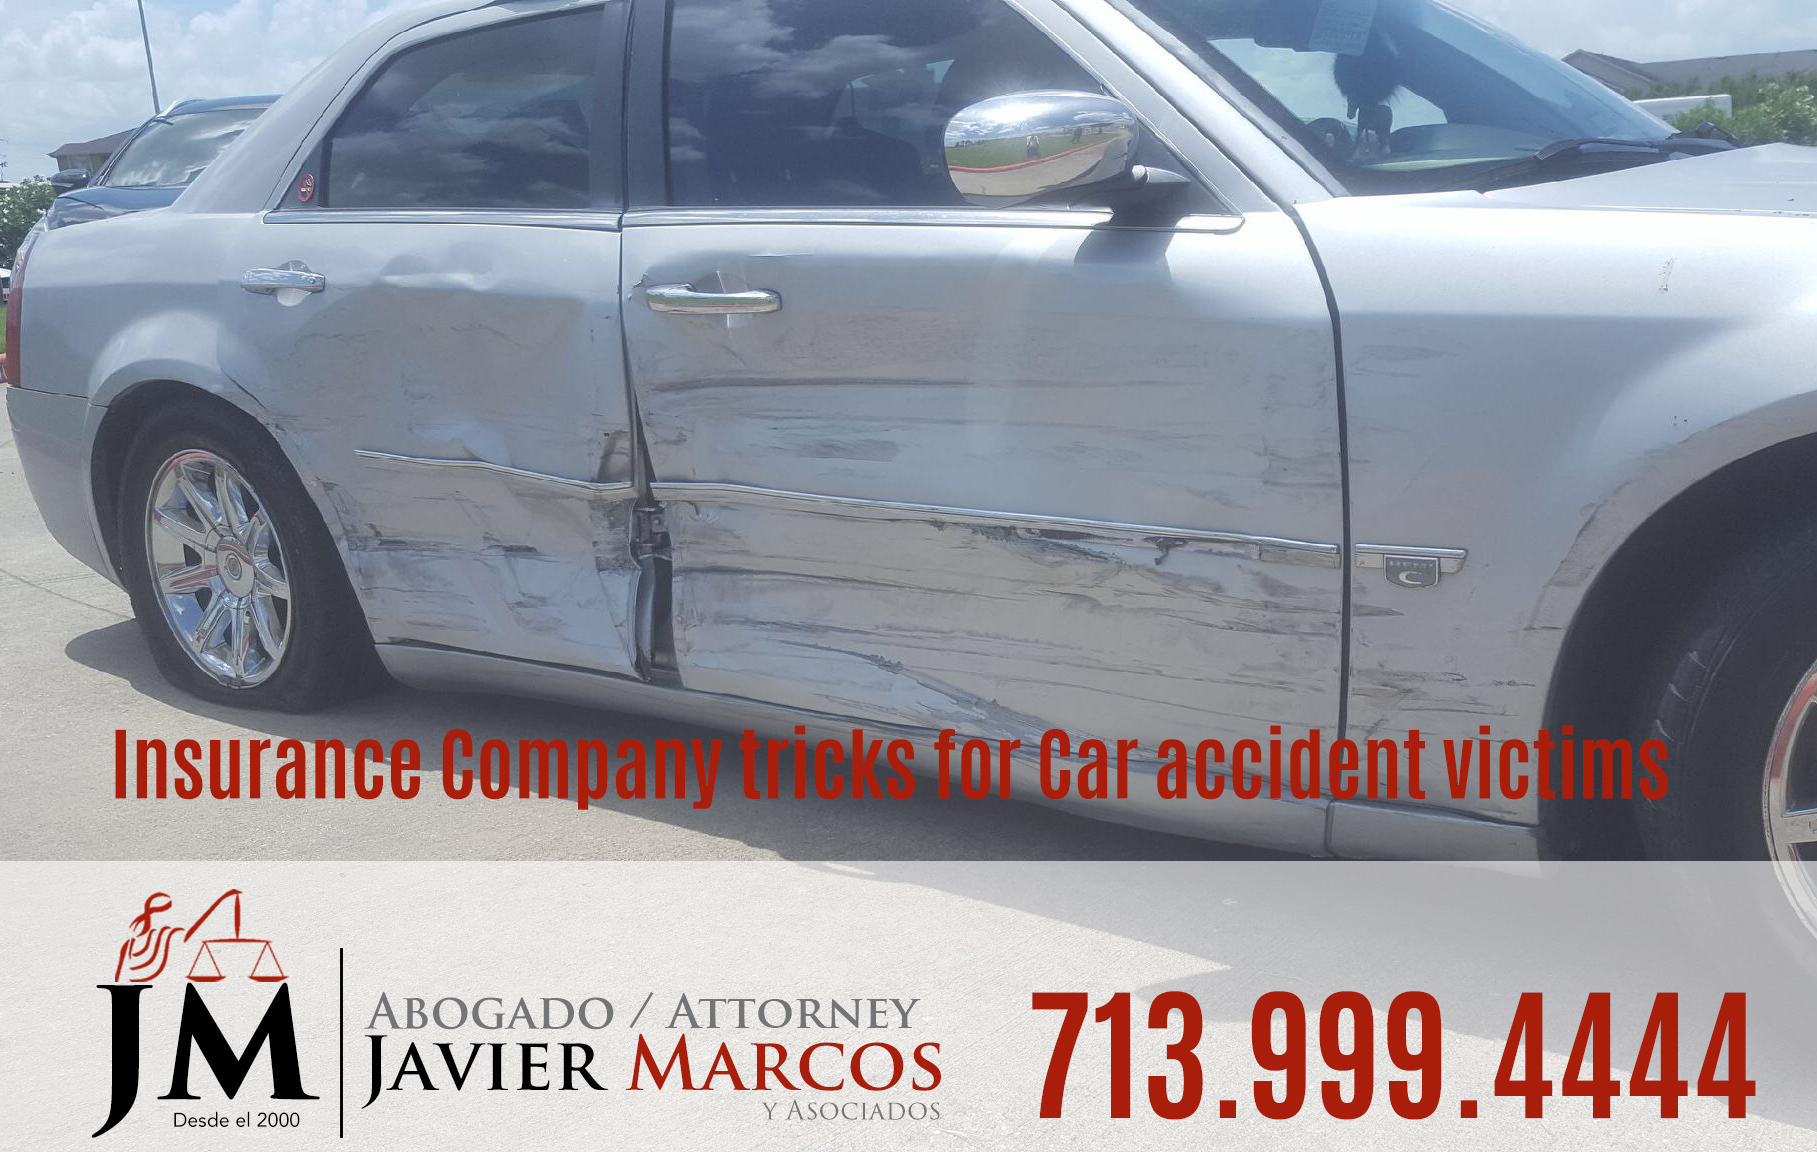 Compania de seguro   Abogado Javier Marcos   713.999.4444